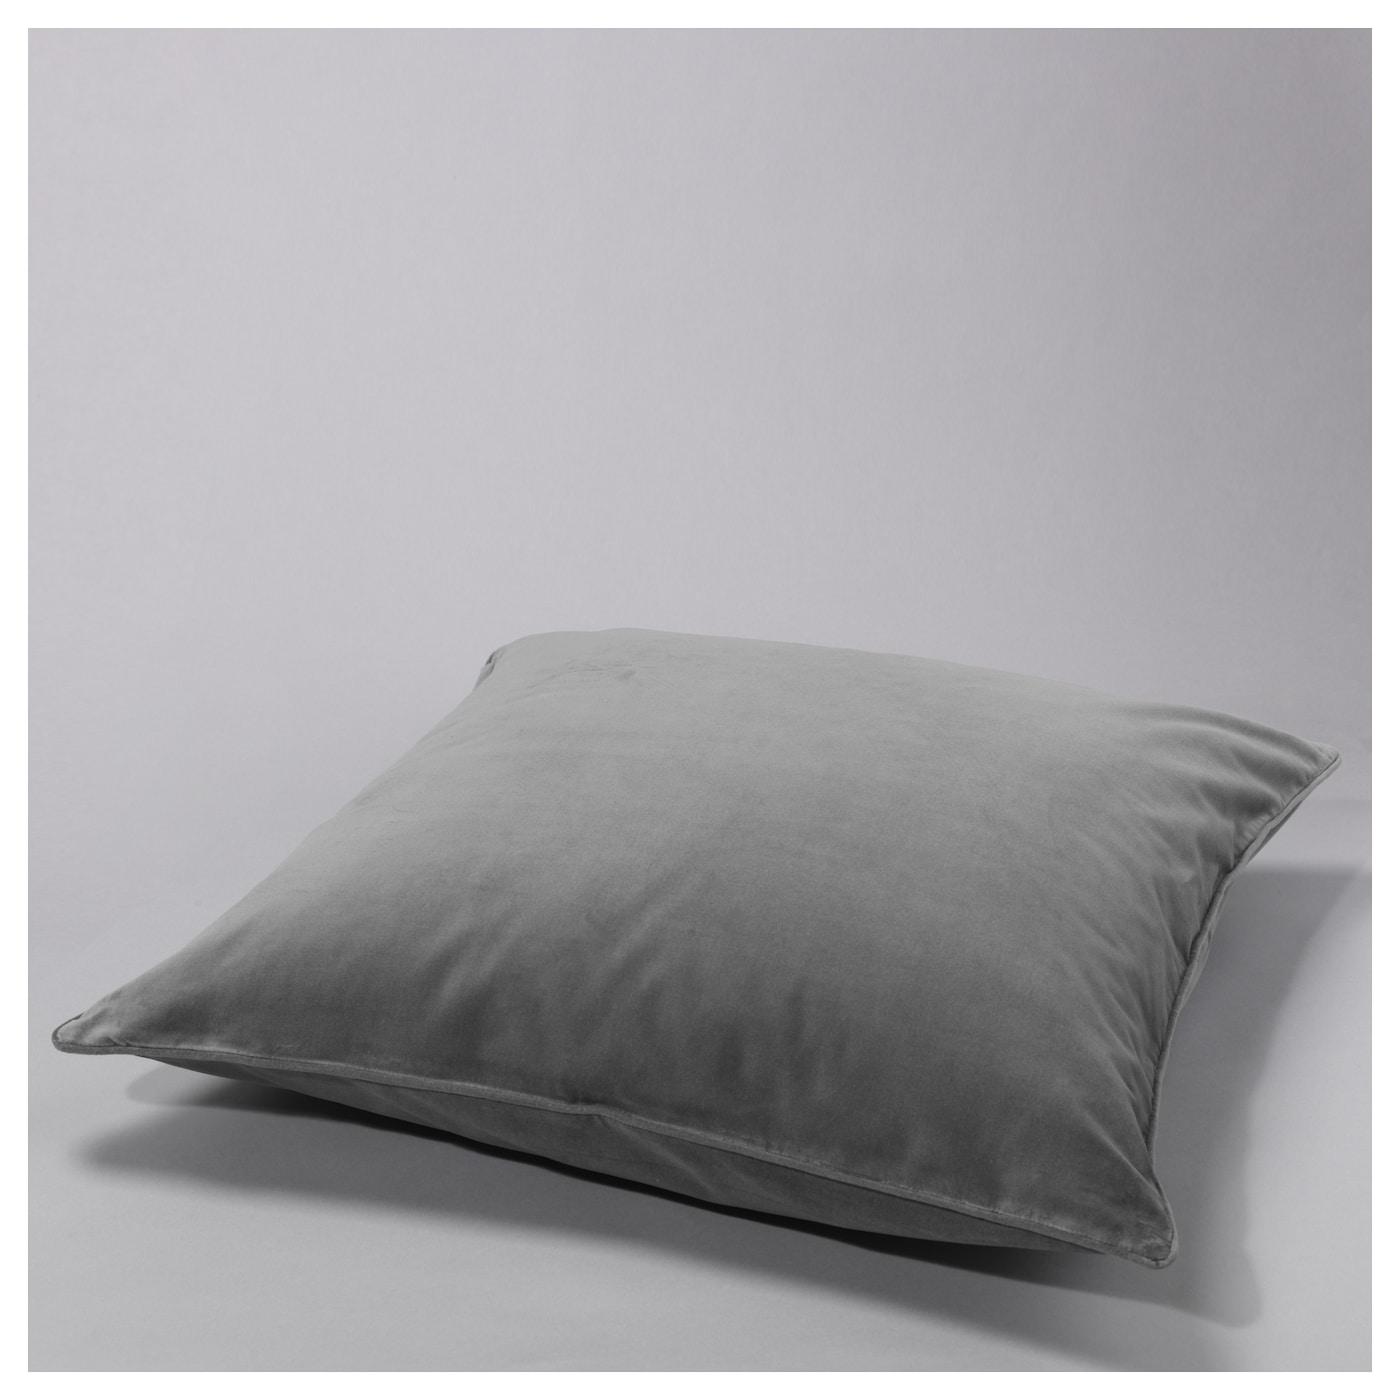 SANELA Cushion cover Grey 65x65 cm IKEA